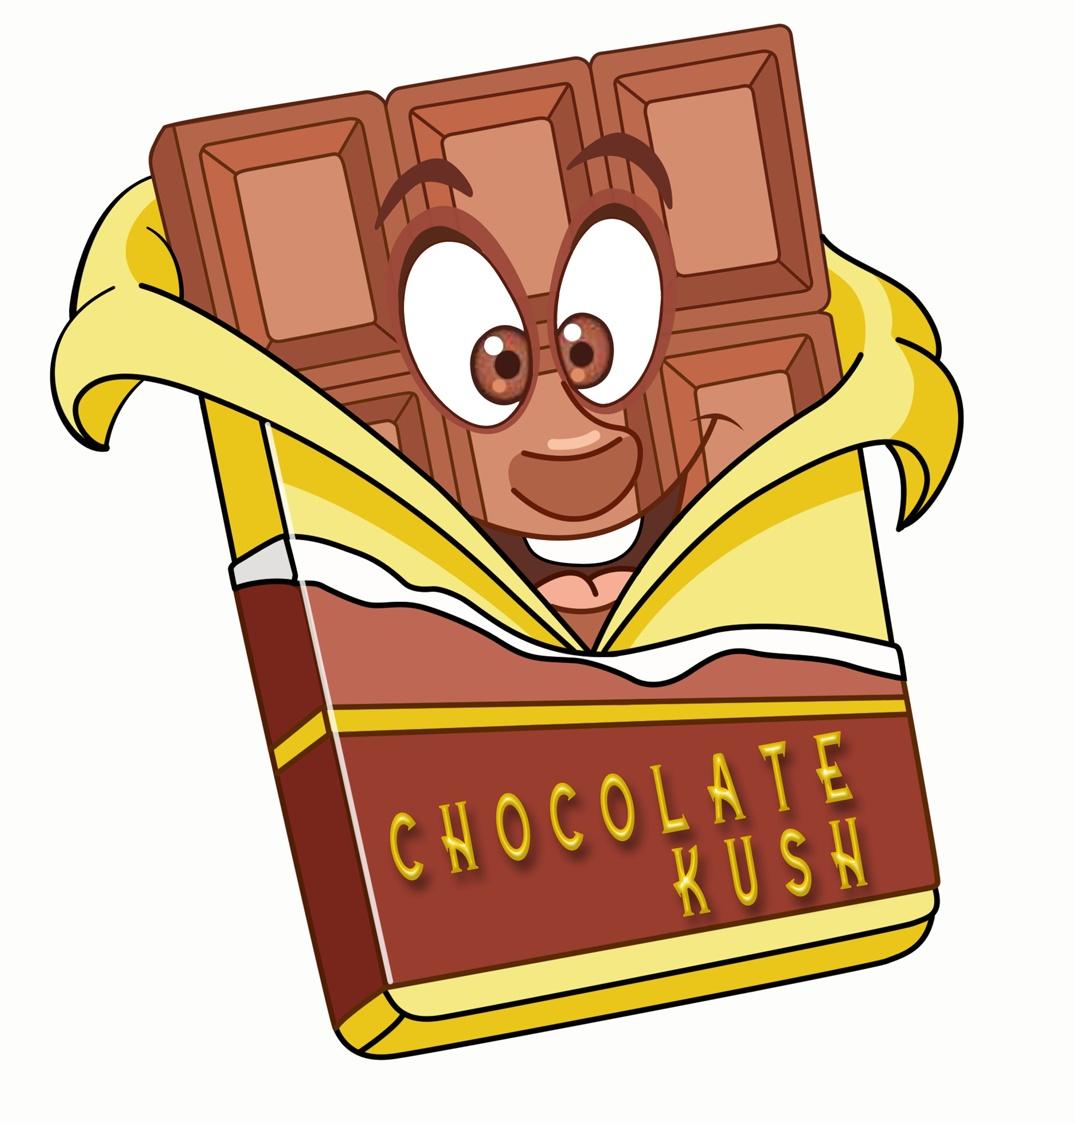 https://0901.nccdn.net/4_2/000/000/017/e75/-chocolate-weedman-gosexyca-1075x1123.jpg